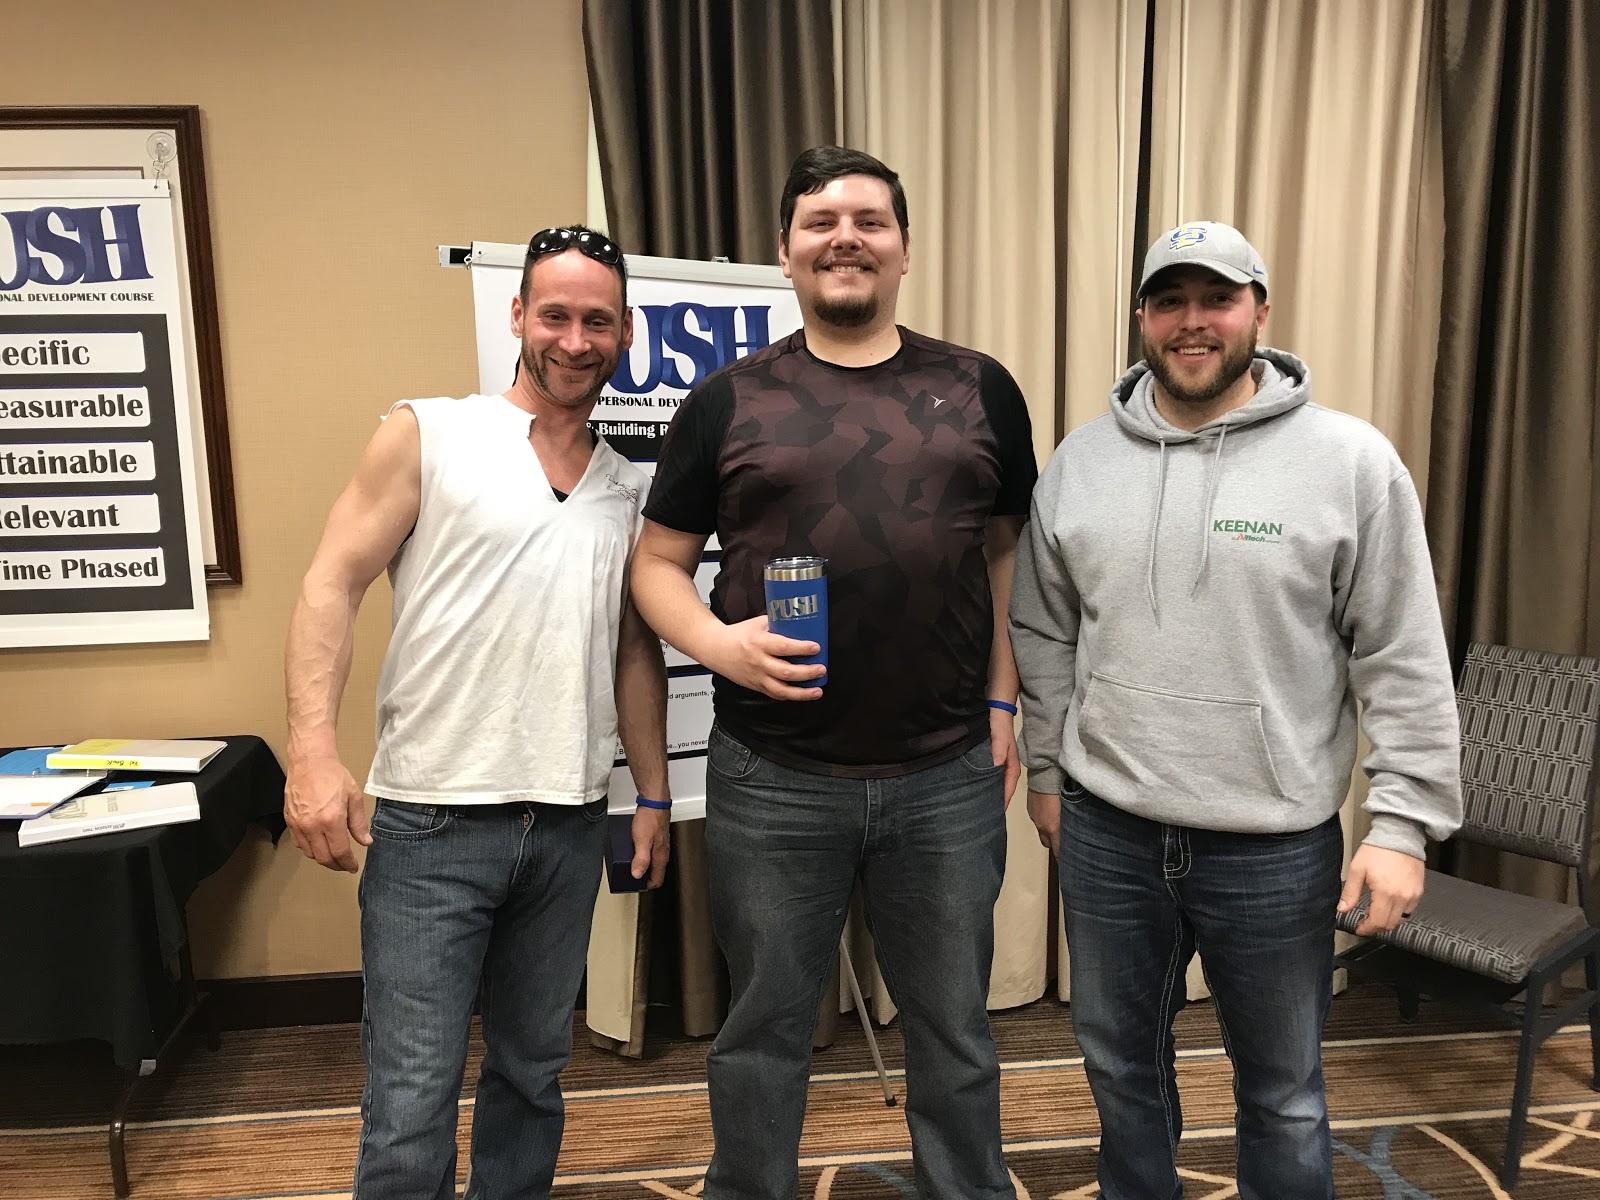 Sioux Falls Session 2 April 10,2018 Awards Nick Peterson, Reece Fulton, Tyson Ronne